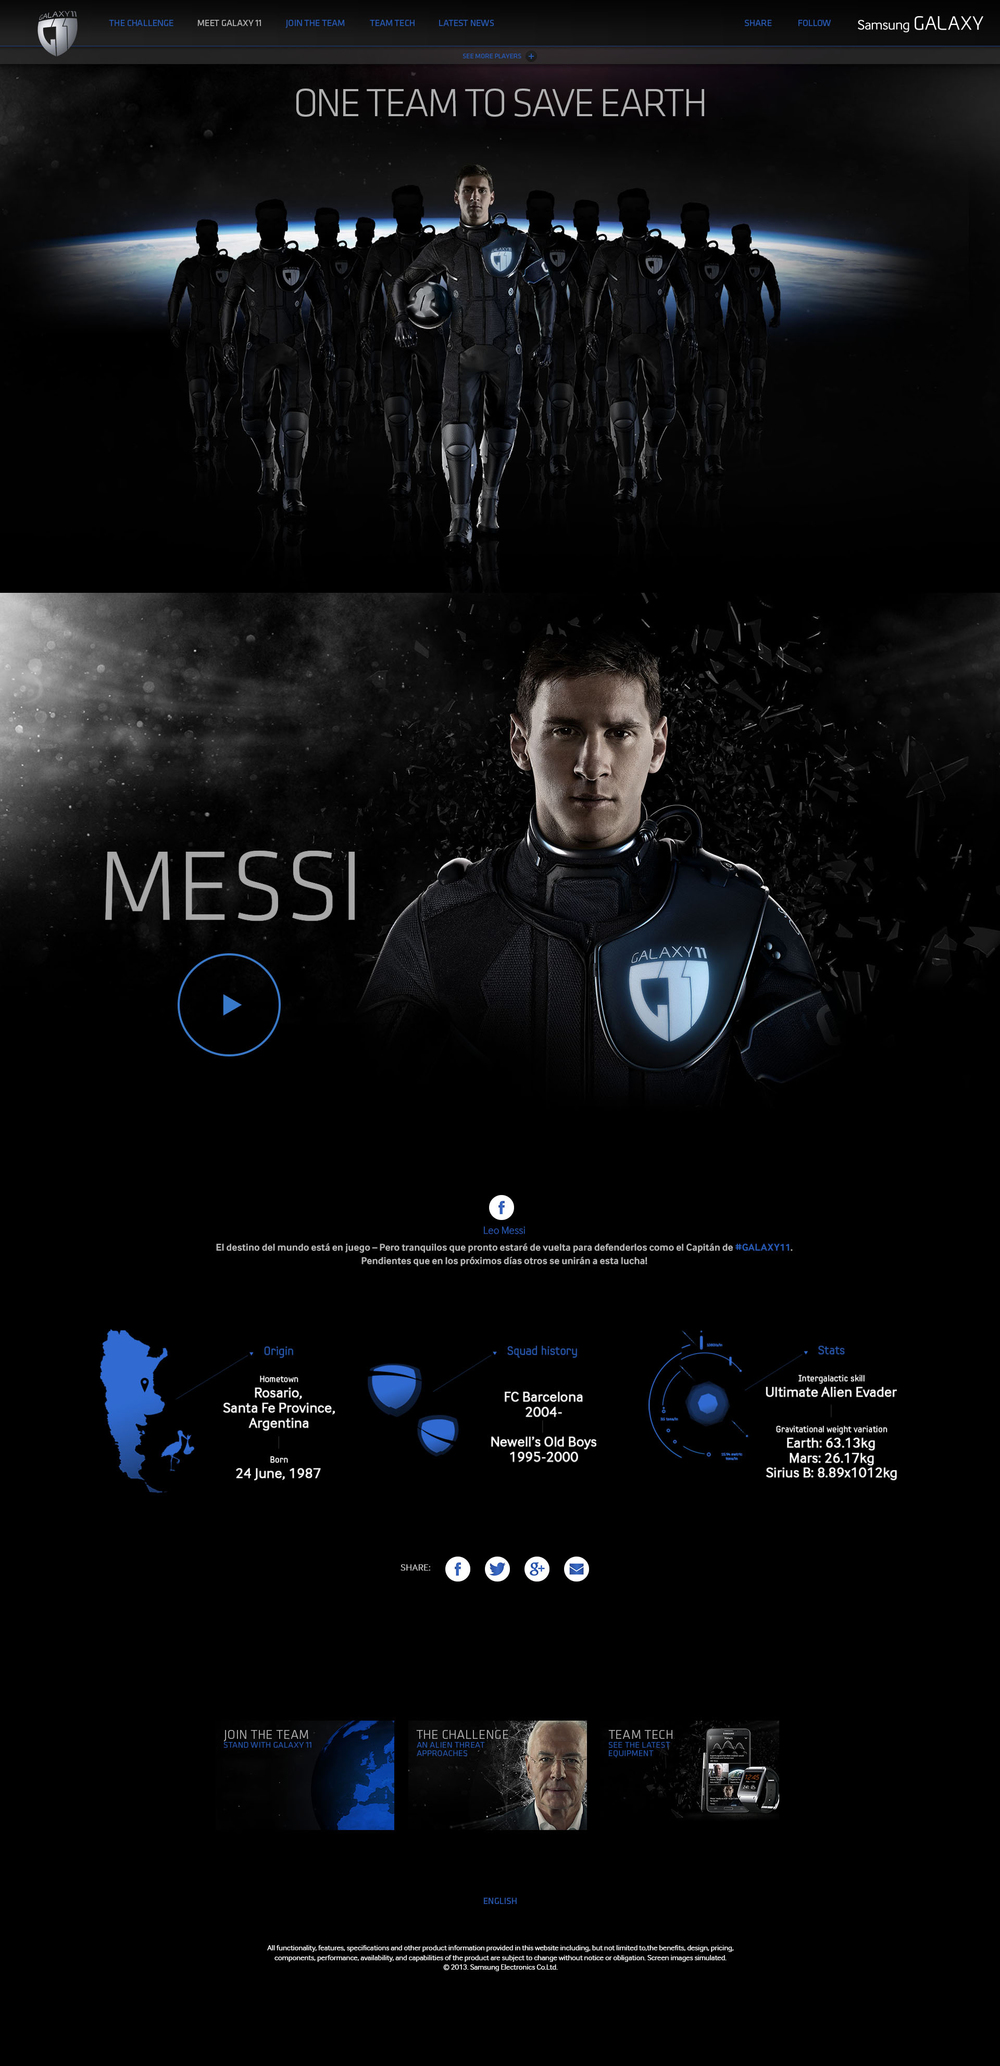 g11_0000_01-Messi.jpg